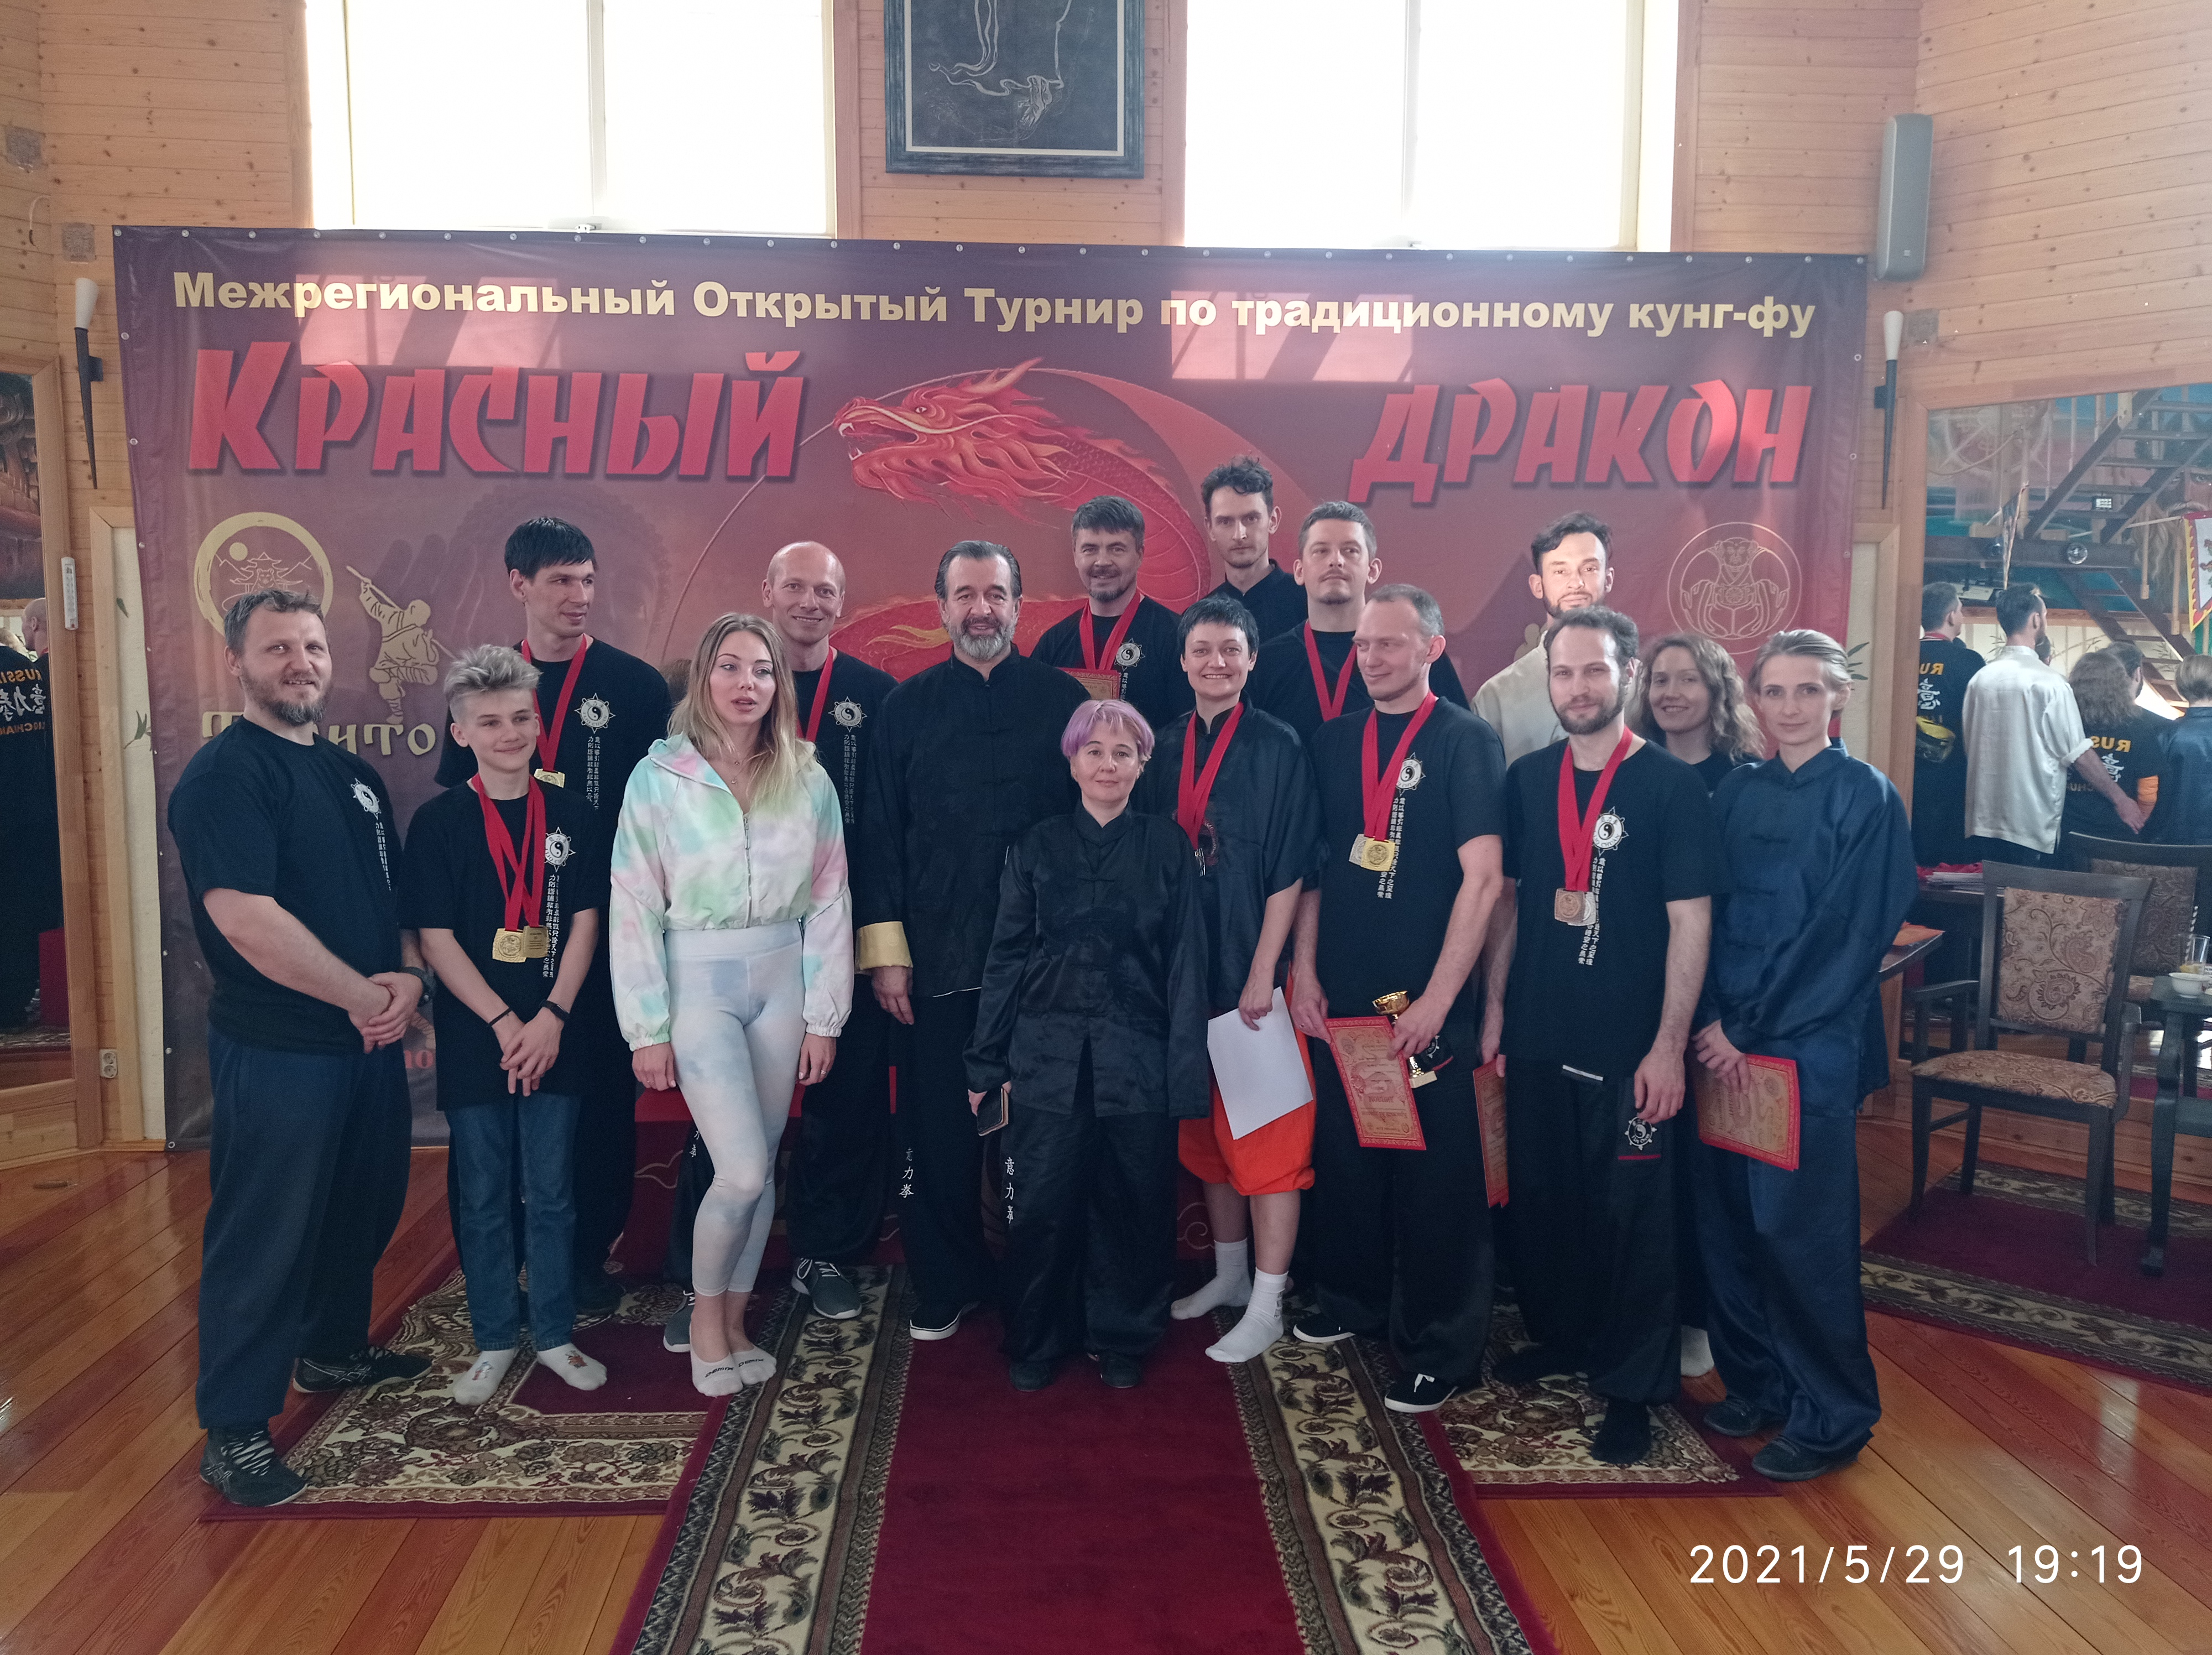 Russian I Liq Chuan team